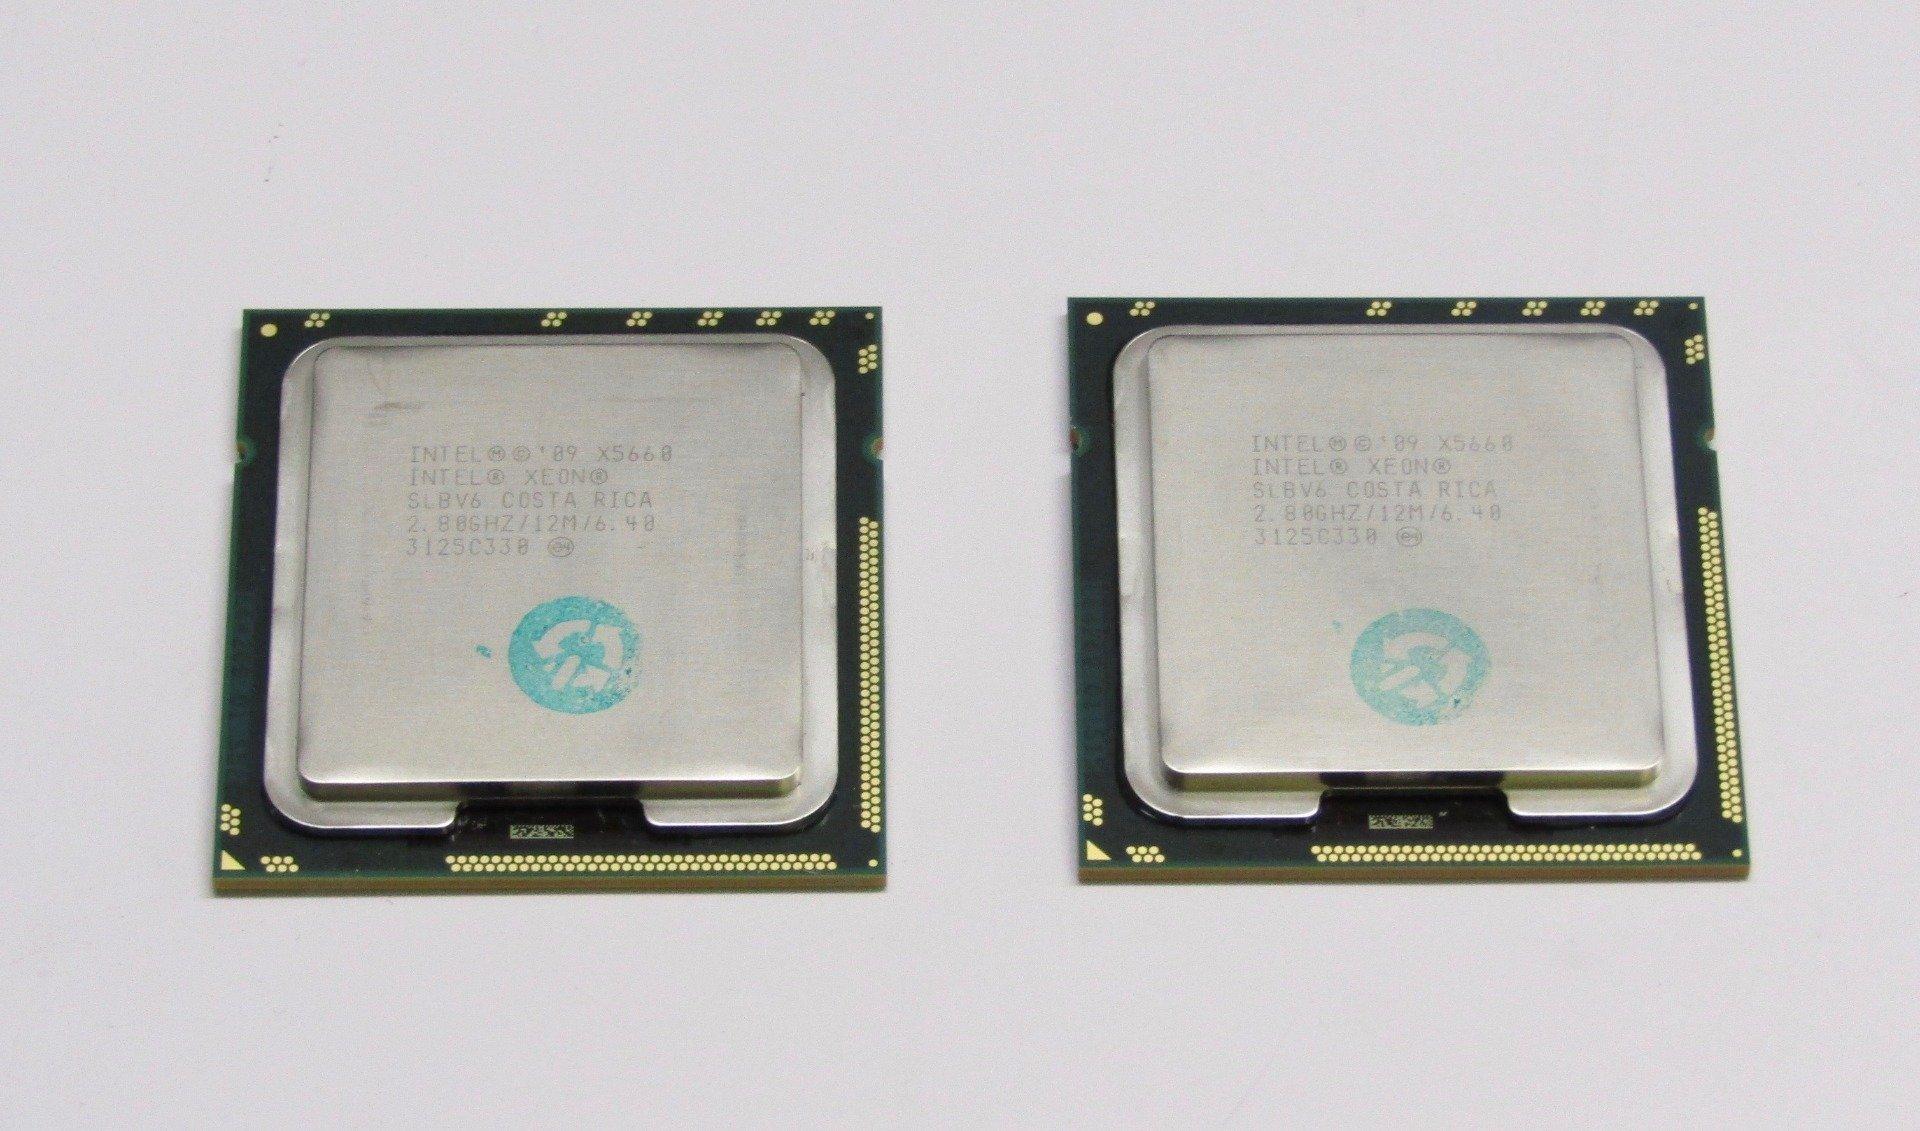 Lot of 10 Intel Xeon X5660 SLBV6 2.80GHz 12MB LGA1366 6-Core CPU Processors